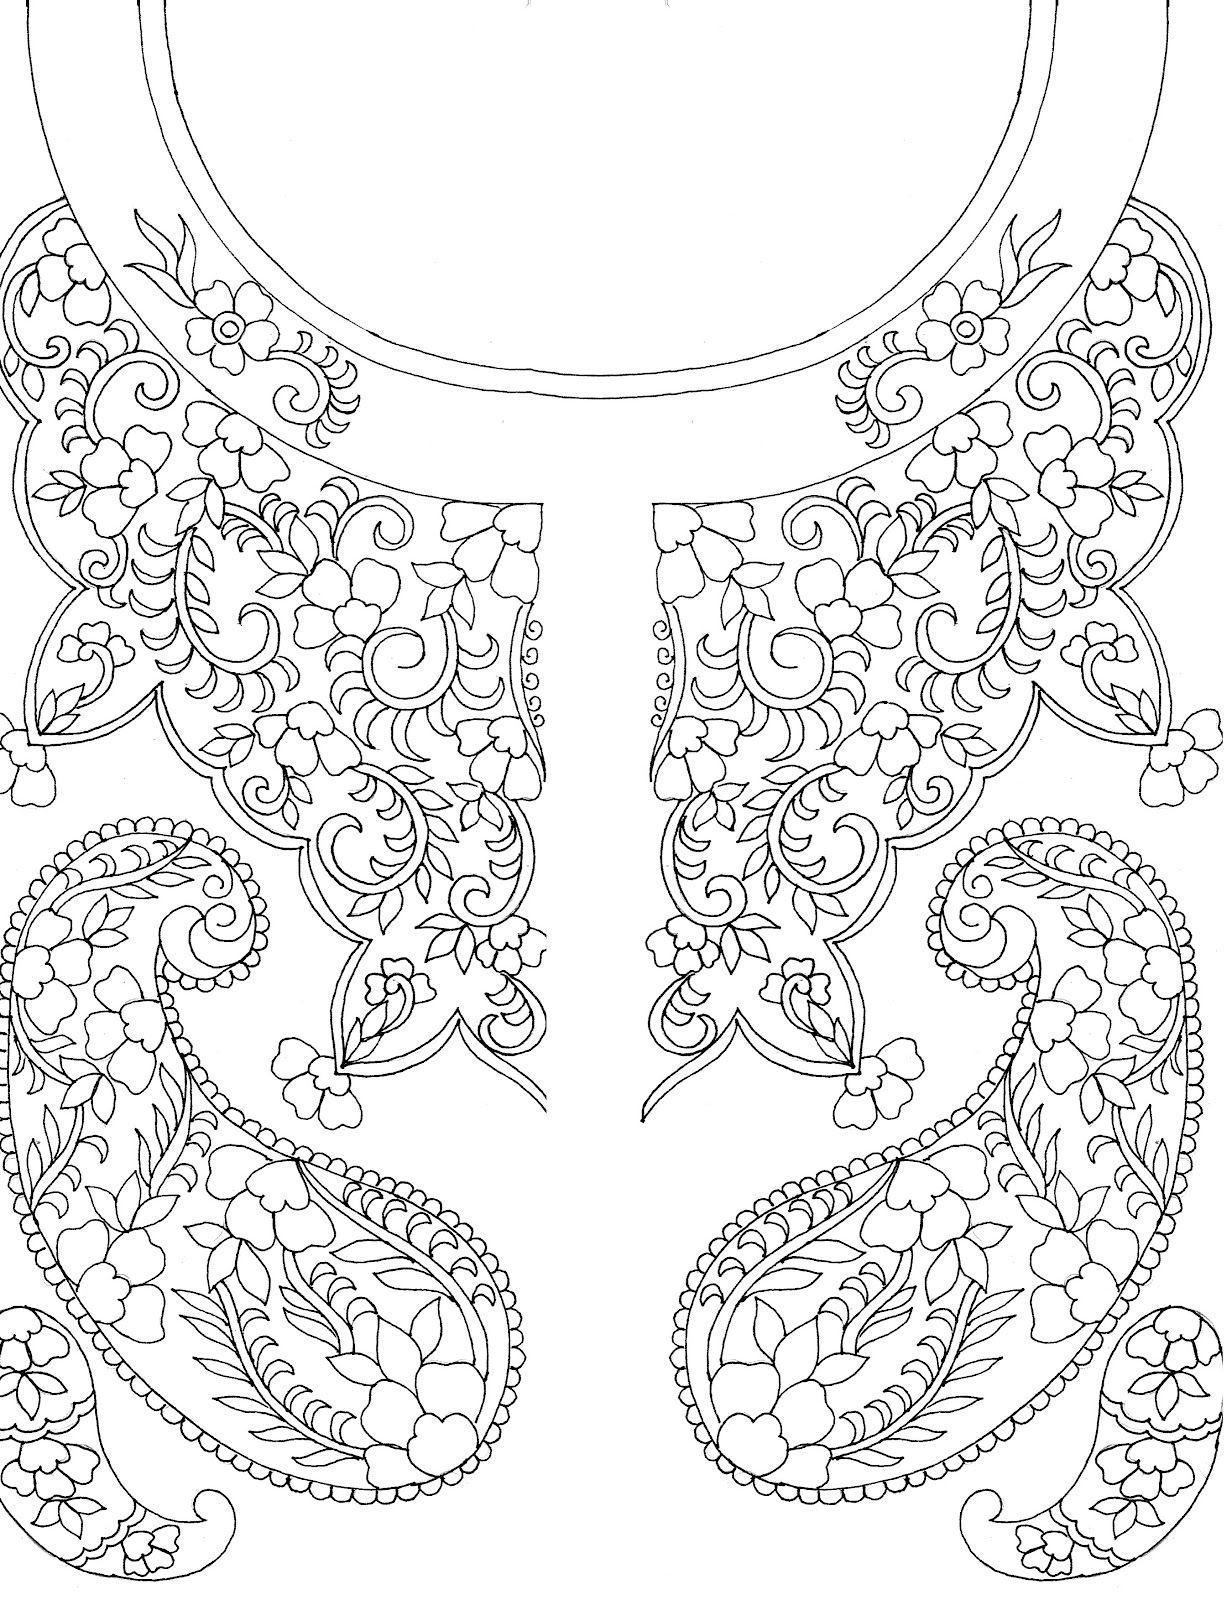 Kashmiri hand embroidery patterns - Google Search | Neckline Designs ...